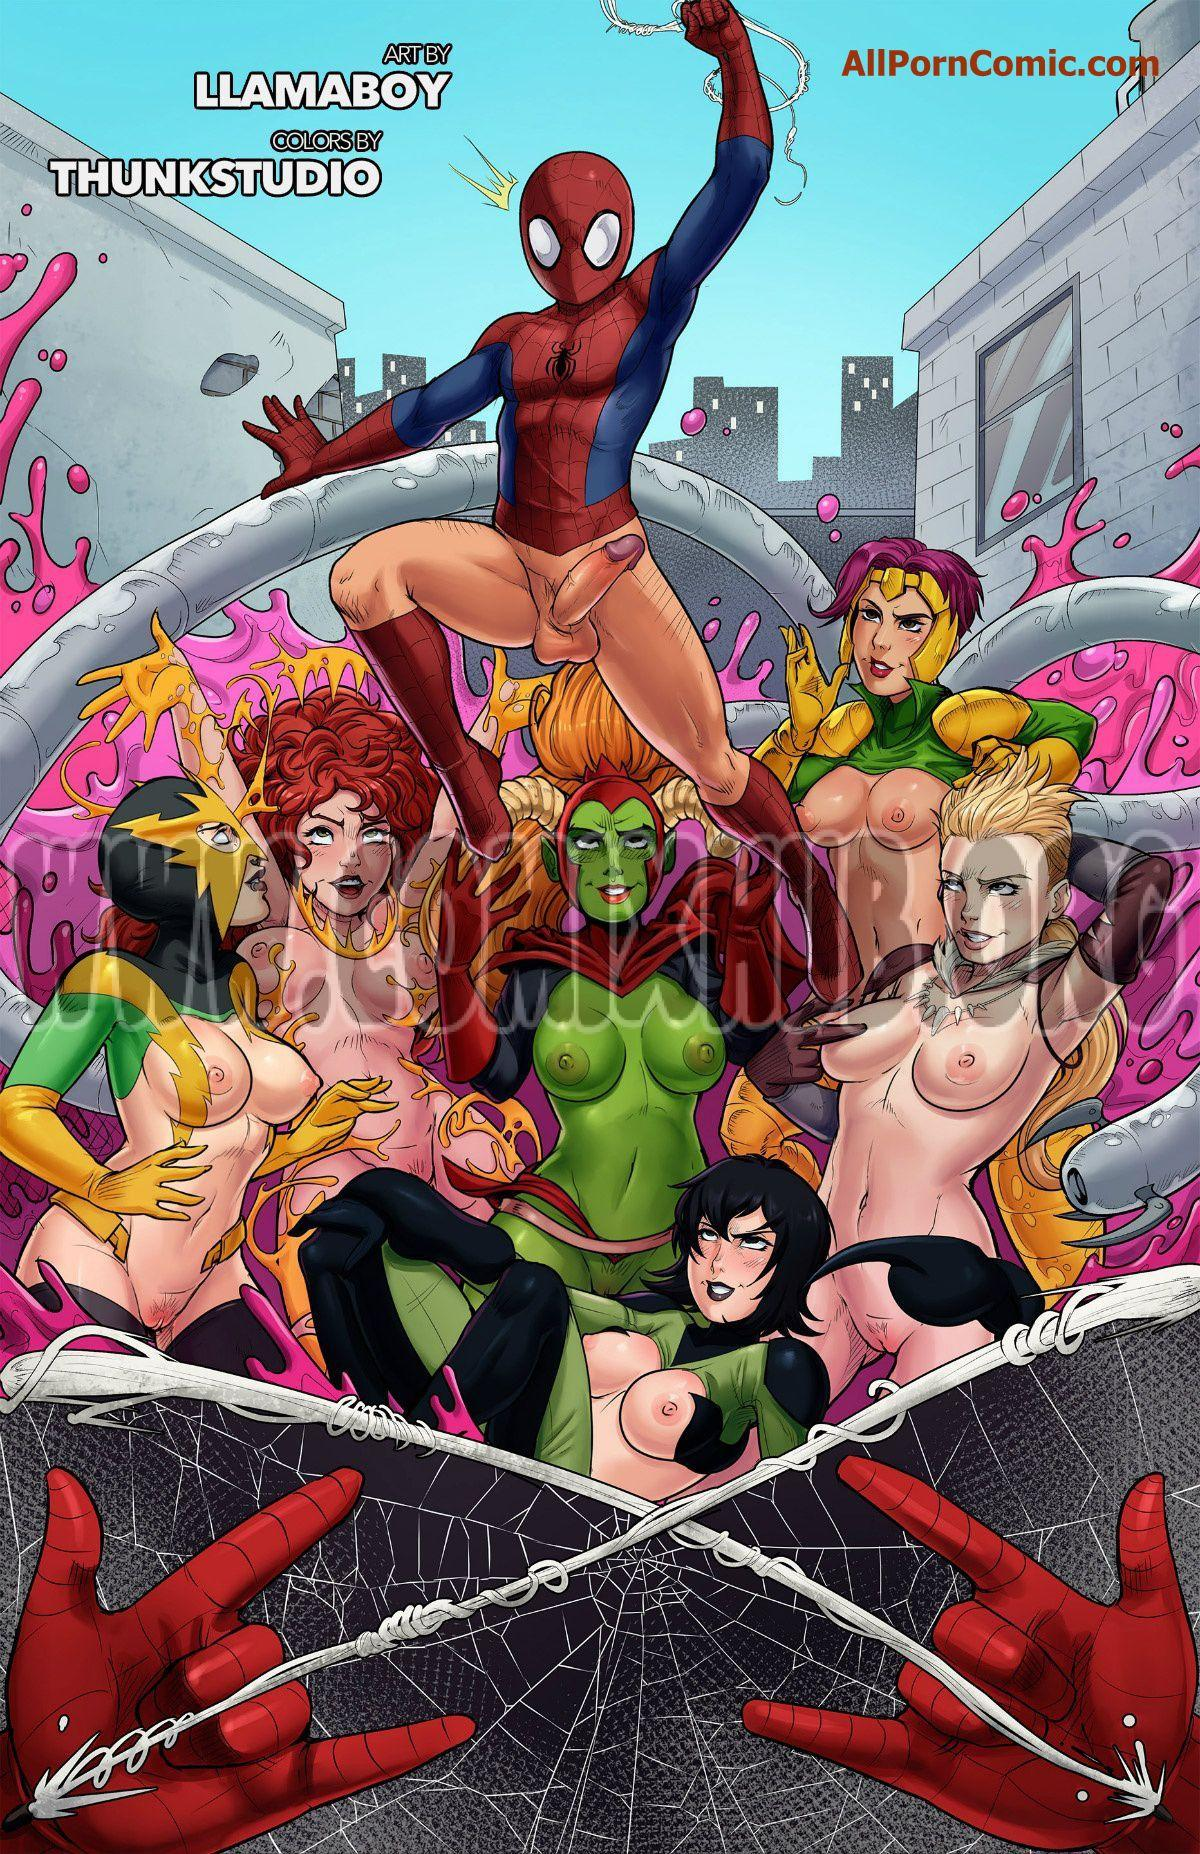 Sinful Six sex comics Oral sex, Anal Sex, Big Tits, Blowjob, Cum Swallow, cunnilingus, Double Penetration, Group Sex, Masturbation, Straight, Titfuck